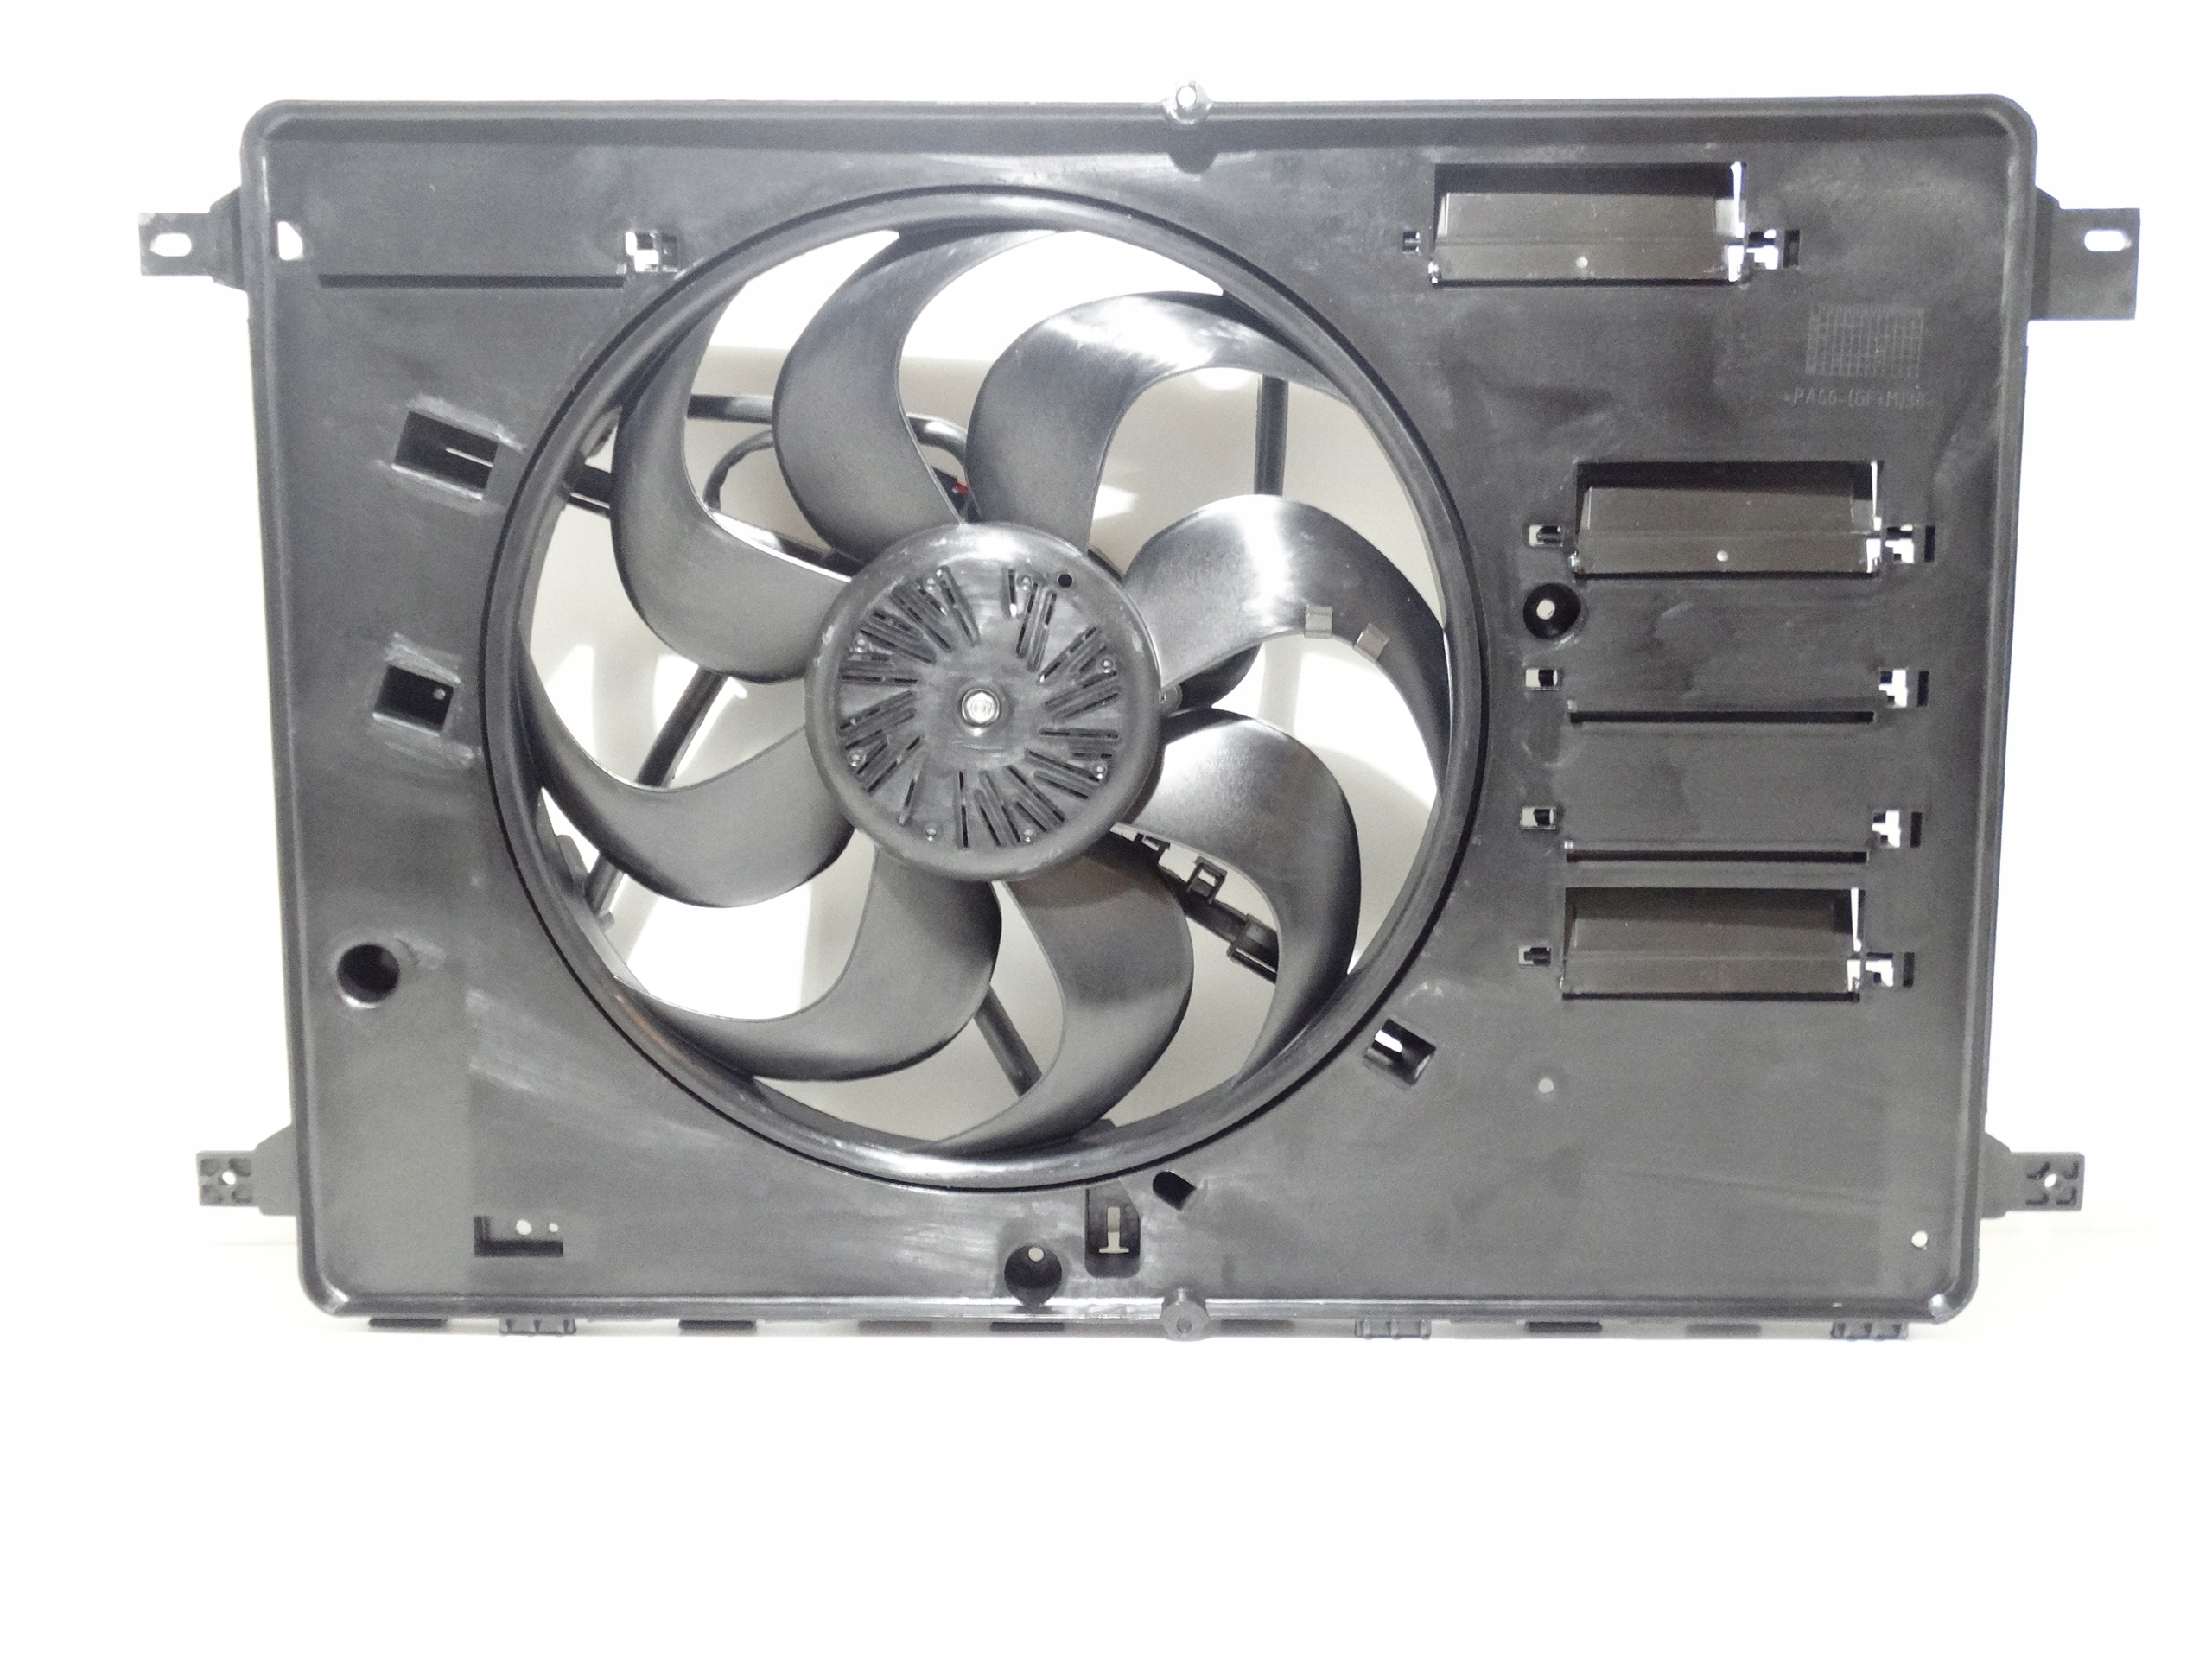 вентилятор радиатора mondeo mk4 s-max galaxy kuga